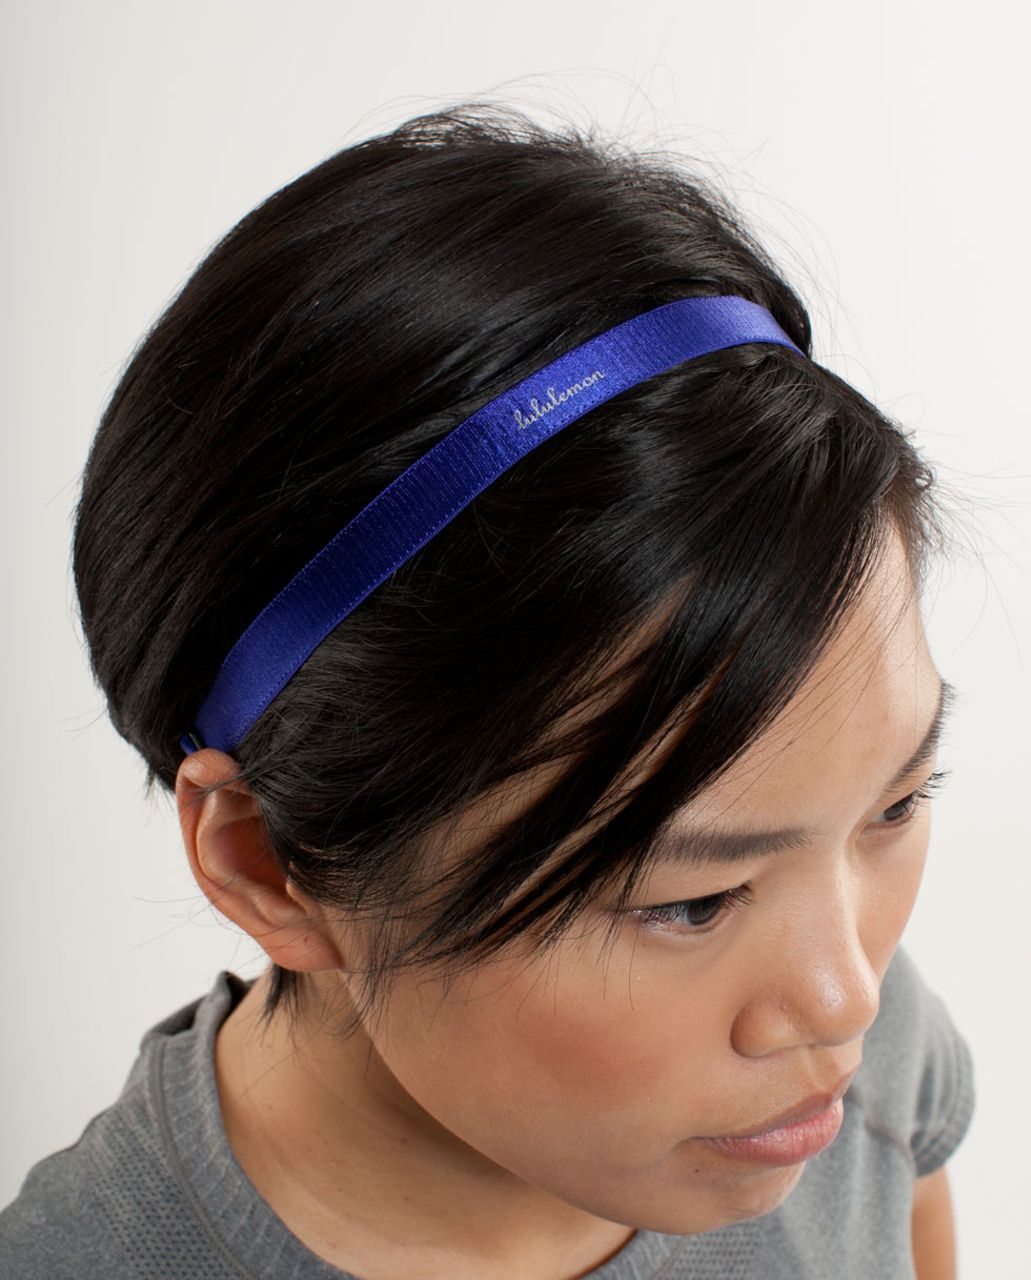 Lululemon Skinny Satin Pirouette - Pigment Blue